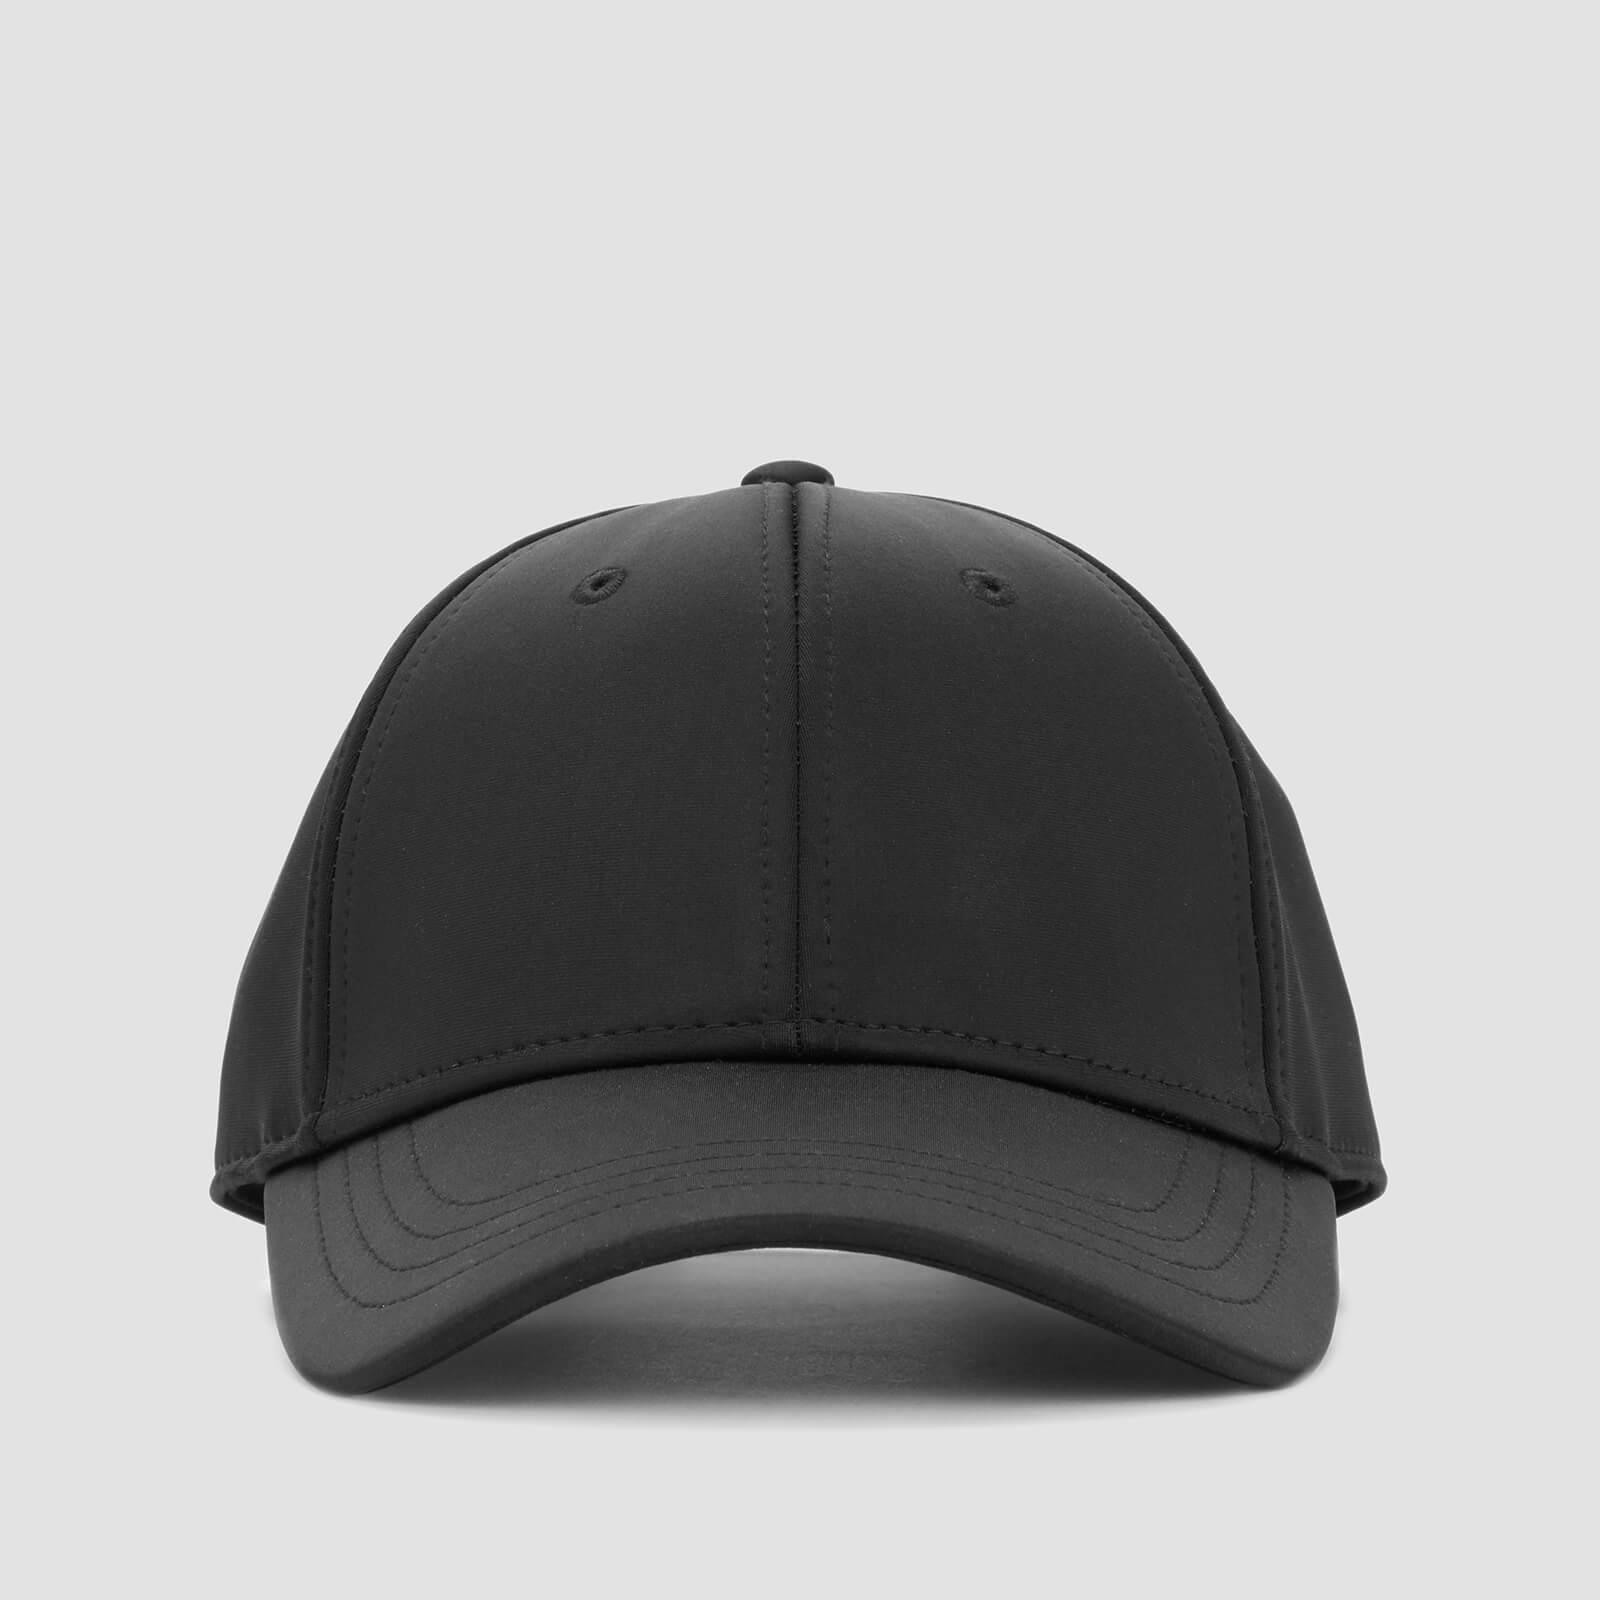 Myprotein Women's Luxe Baseball Cap - Black